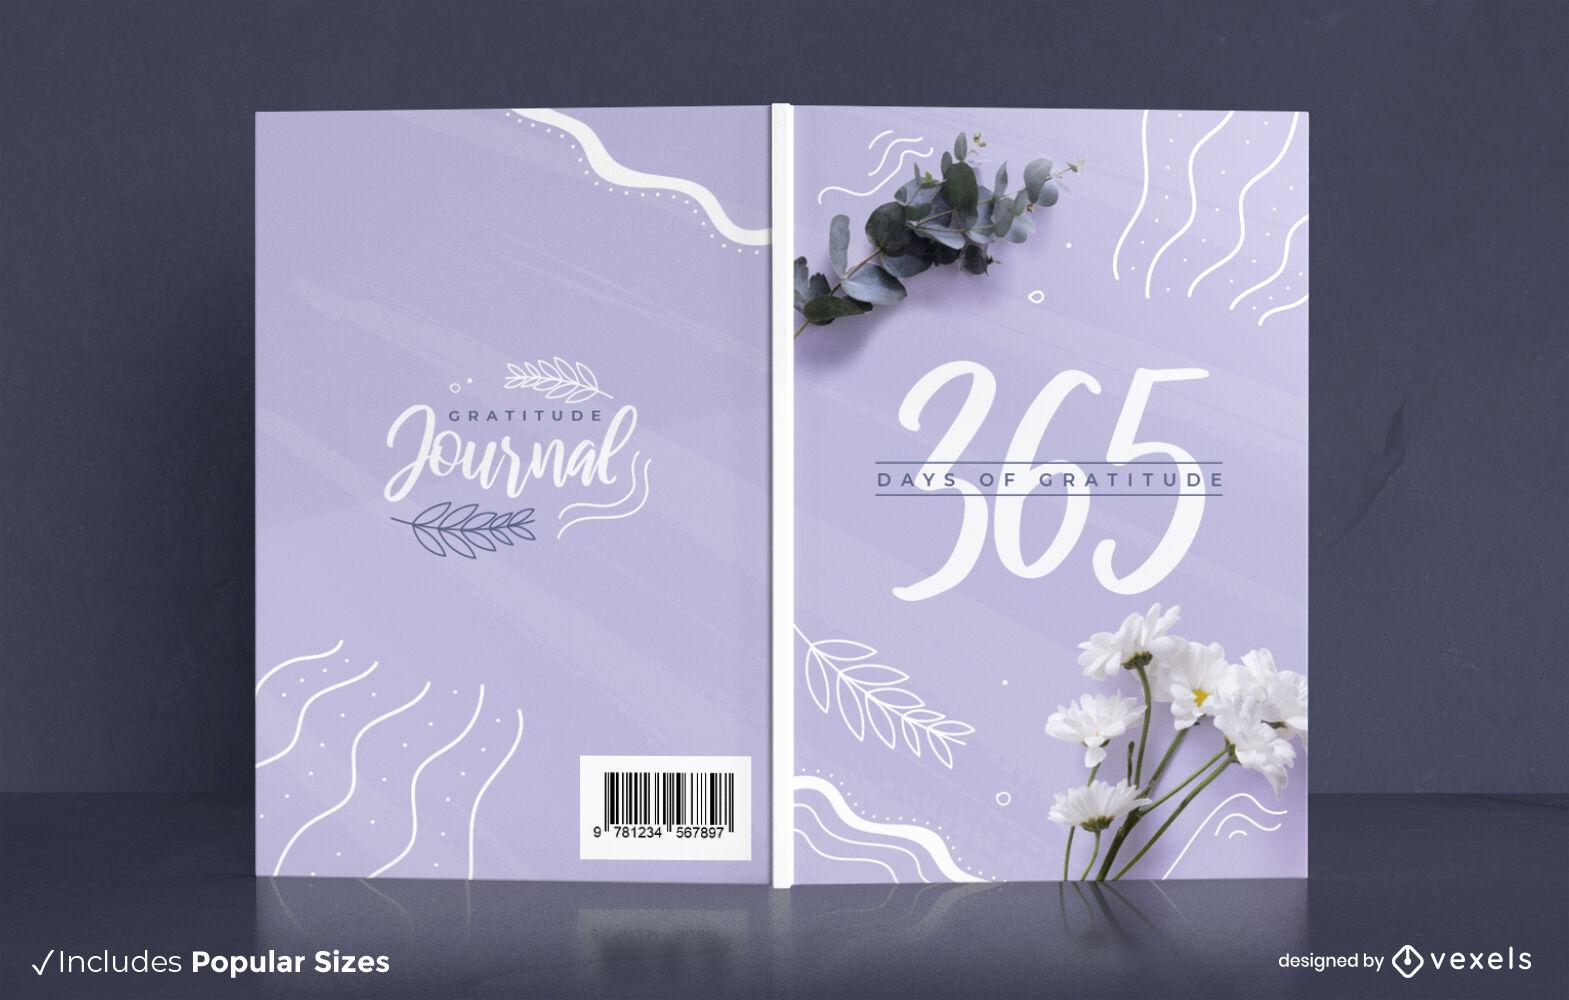 Gratitude journal floral nature cover design